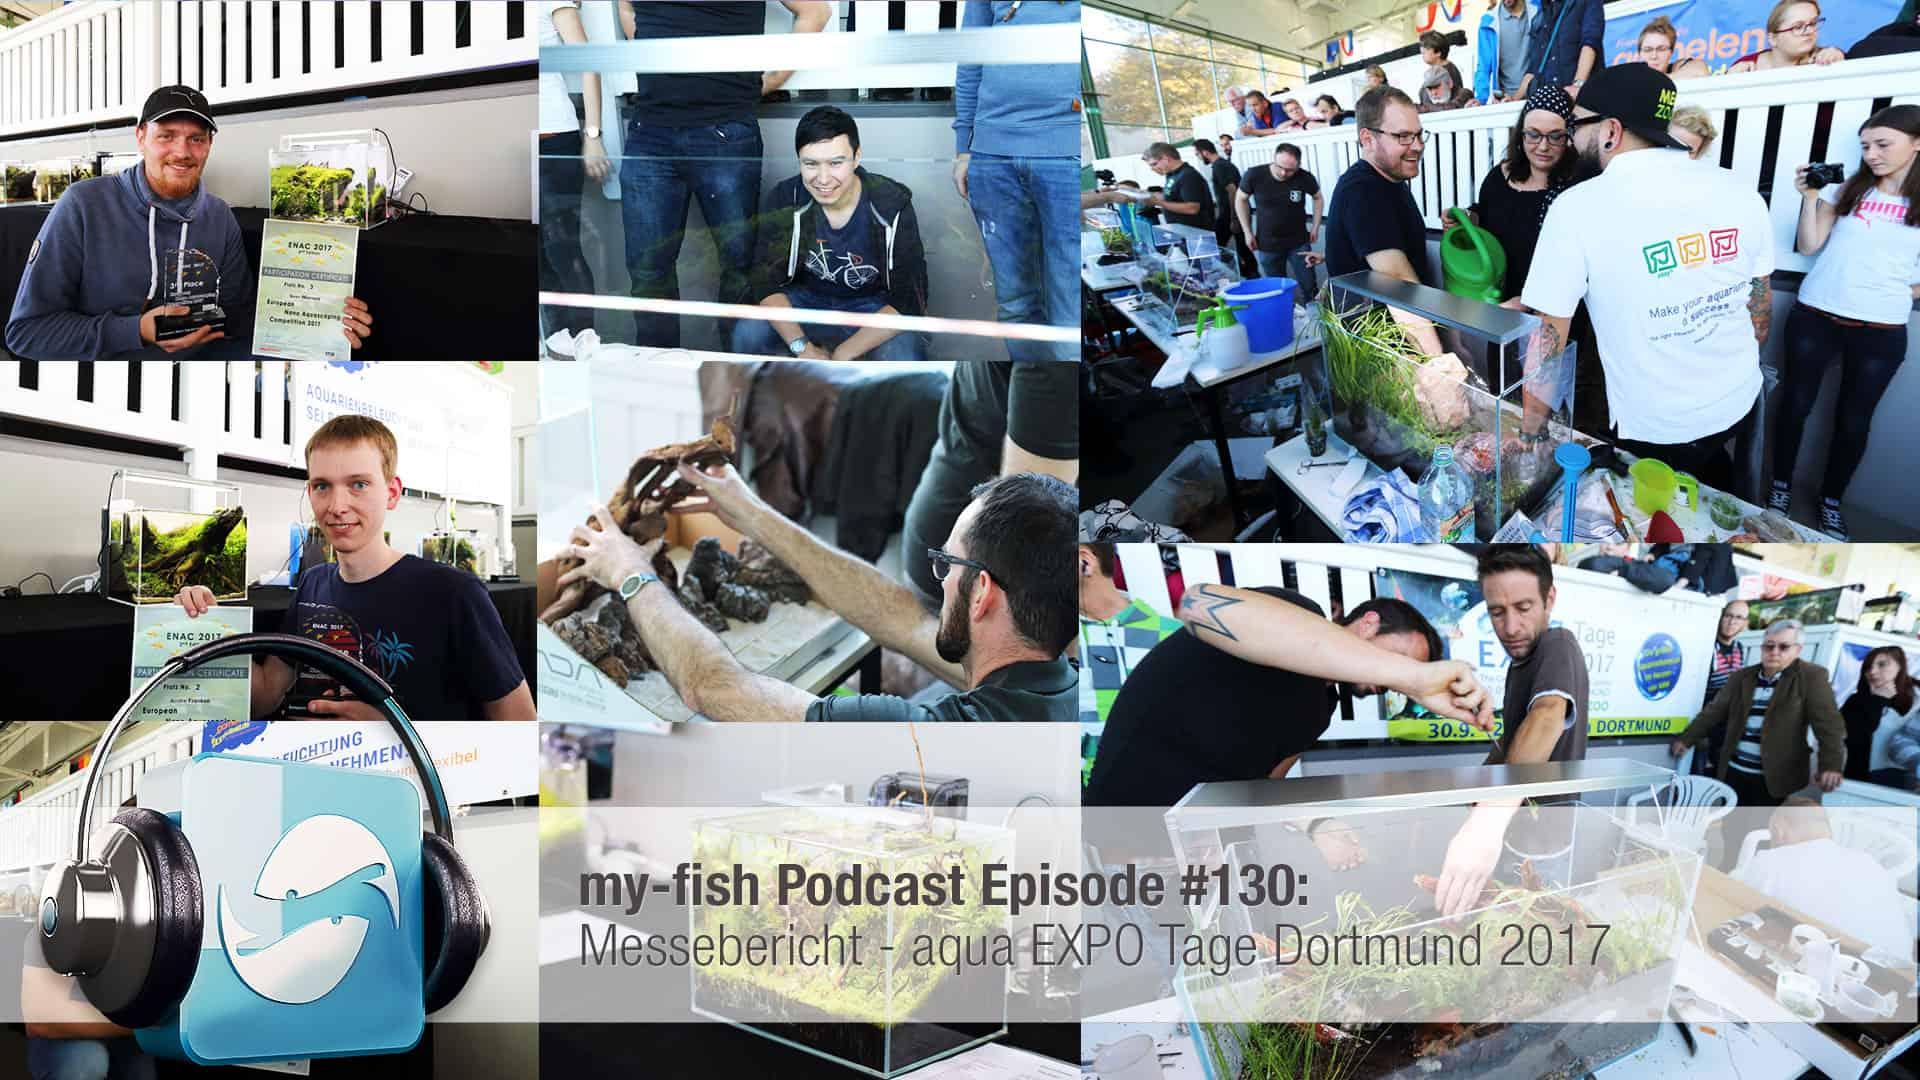 Podcast Episode #130: Messebericht - aqua EXPO Tage Dortmund 2017 1